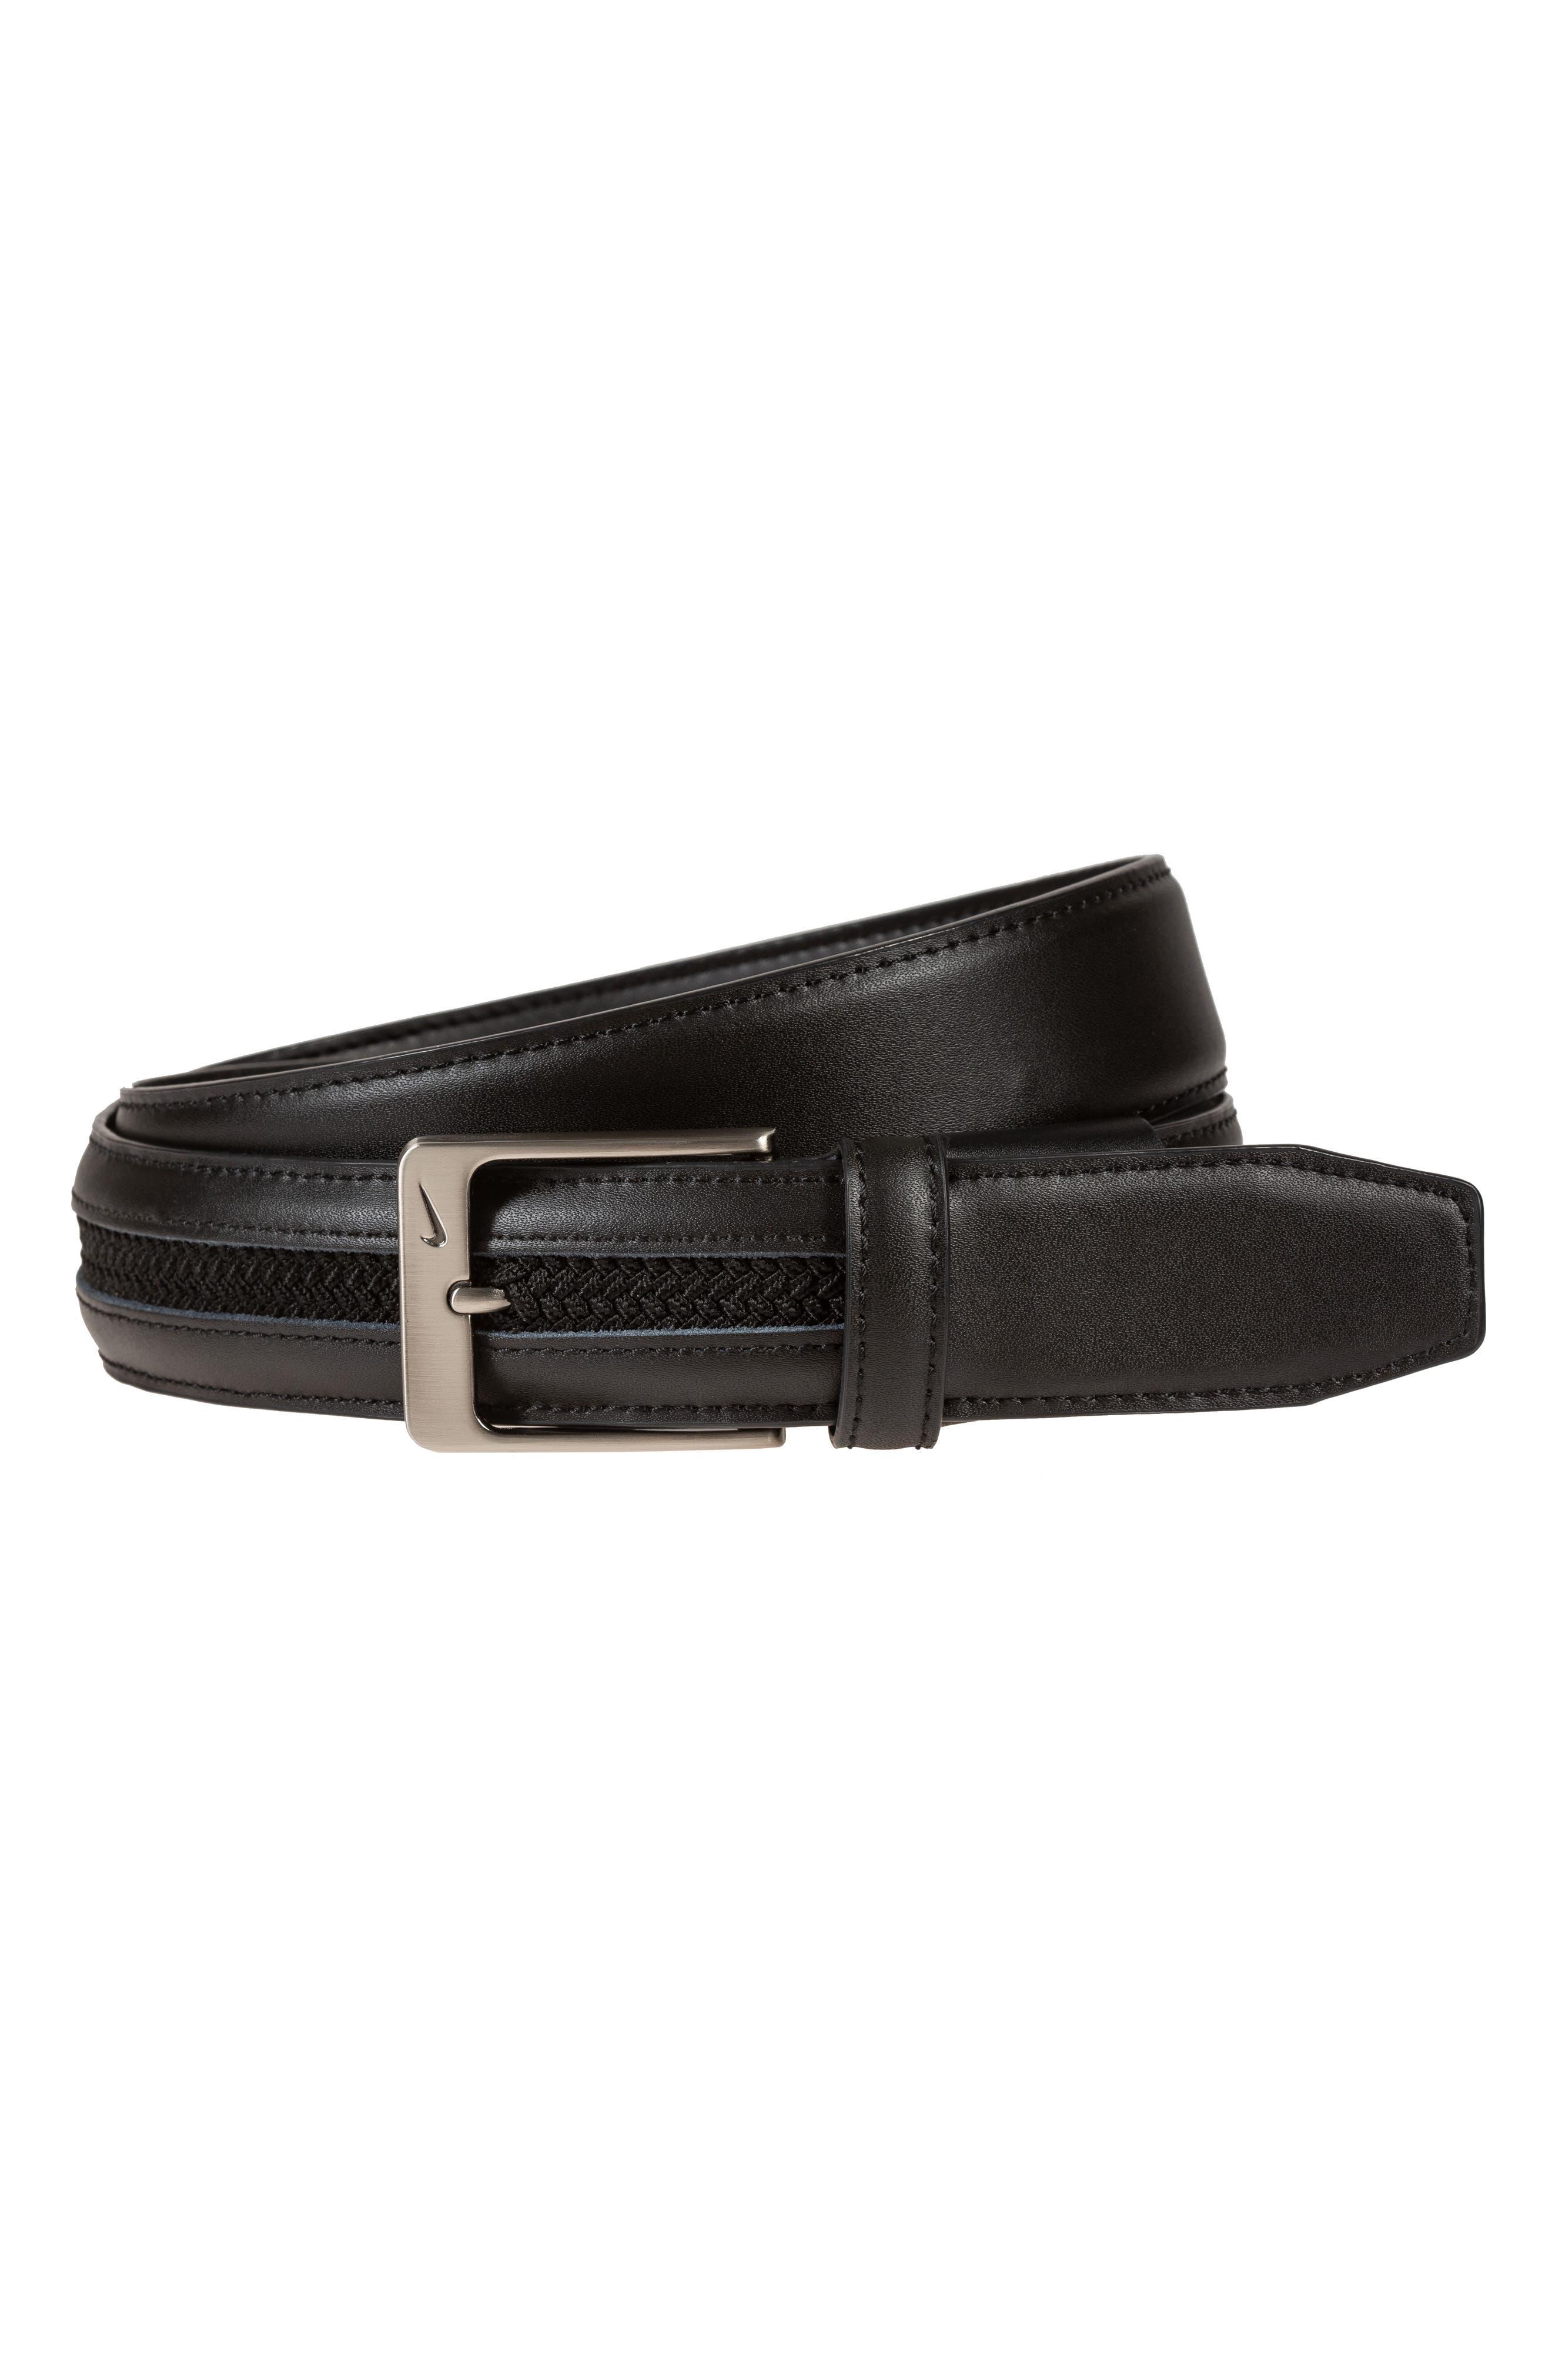 Nike G-Flex Woven Leather Belt, Black